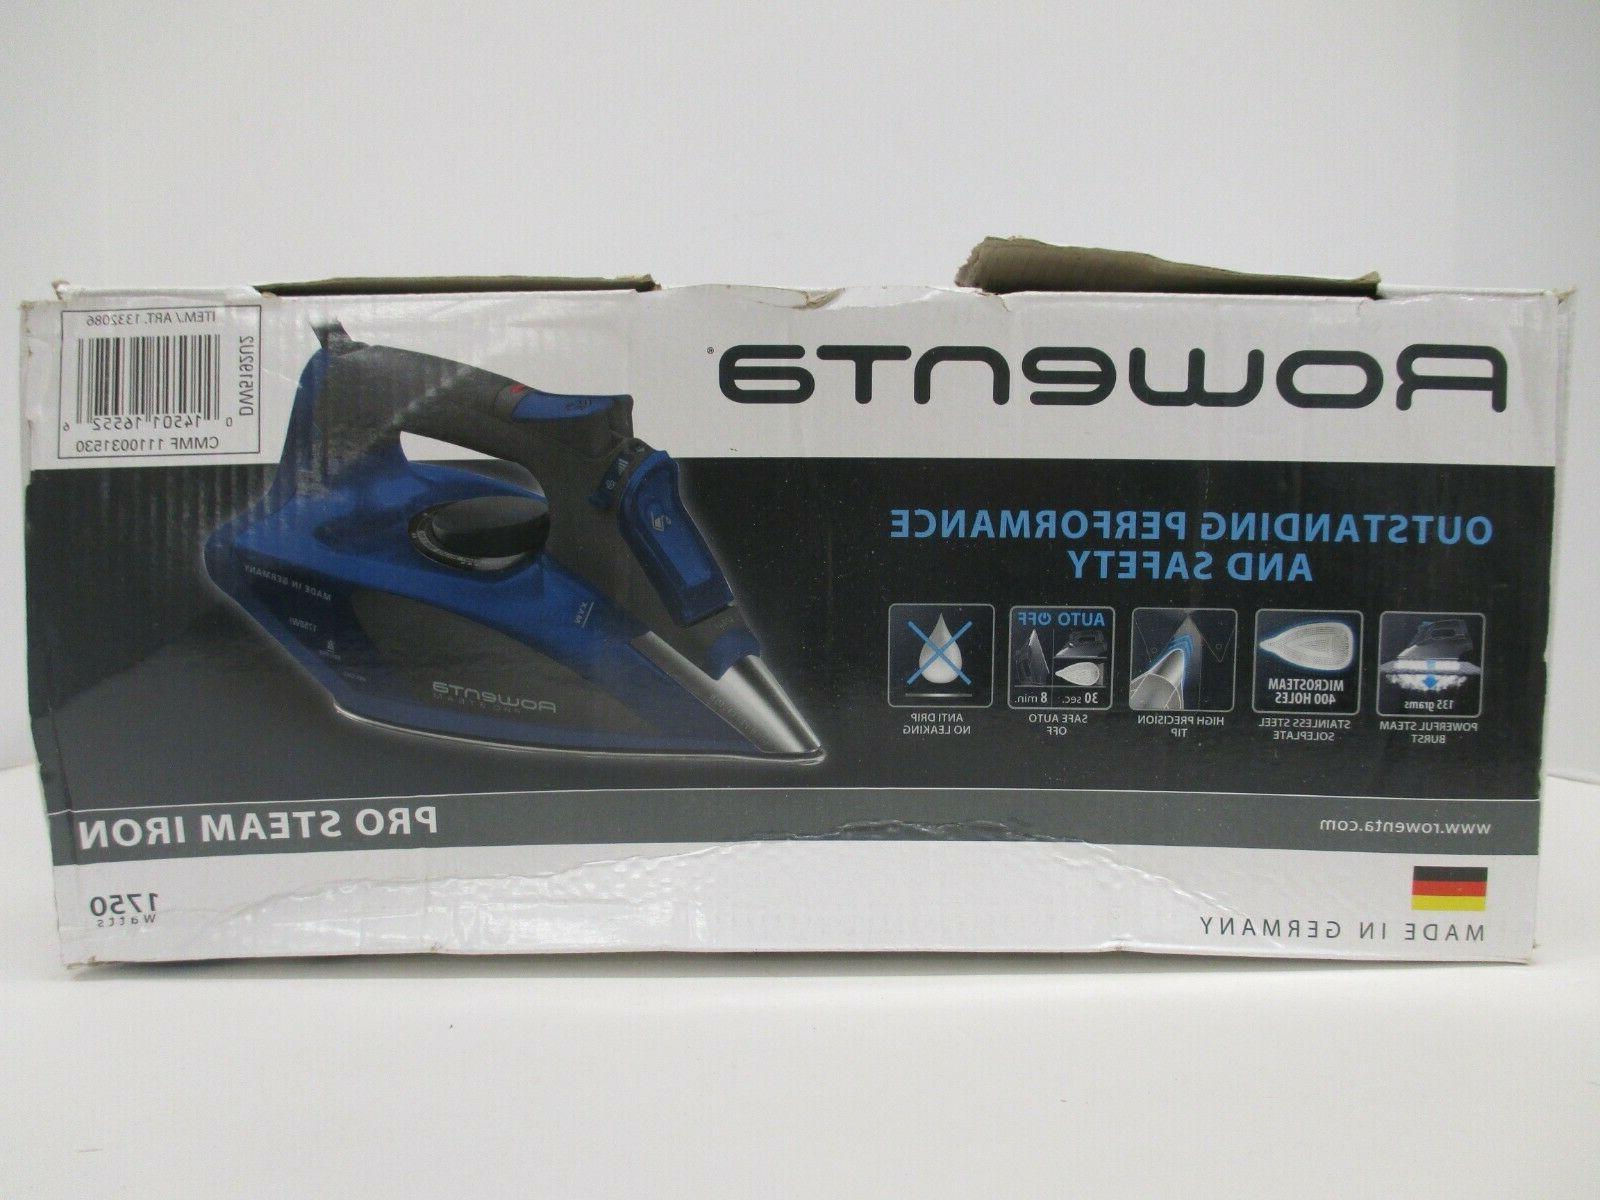 Rowenta DW5192U2 Iron Stainless with Auto-Off